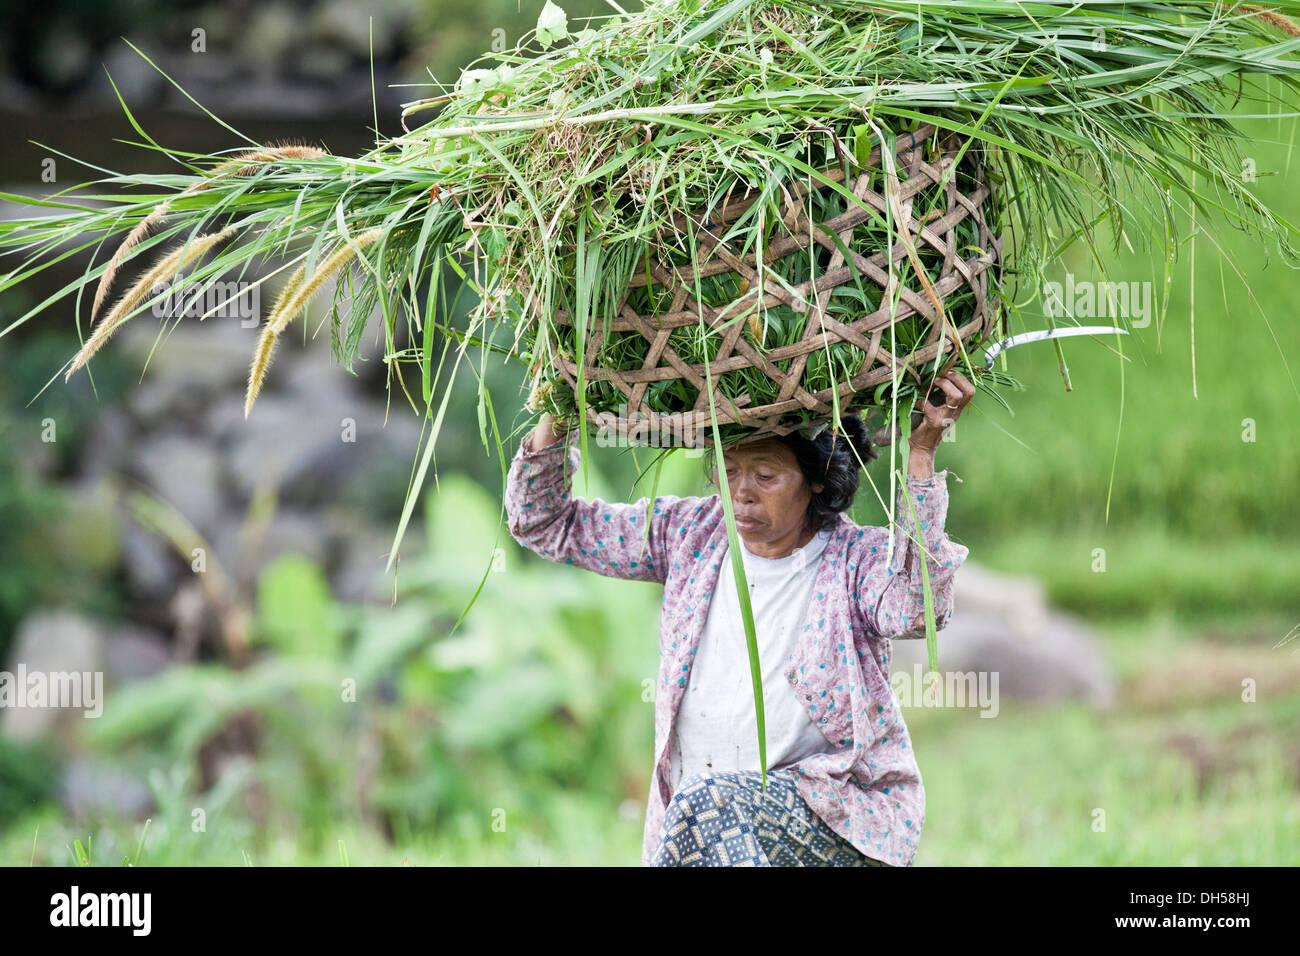 Indonesian farmer carrying the harvest in a basket on her head, Terara, Lombok island, Nusa Tenggara Barat Province, Indonesia - Stock Image